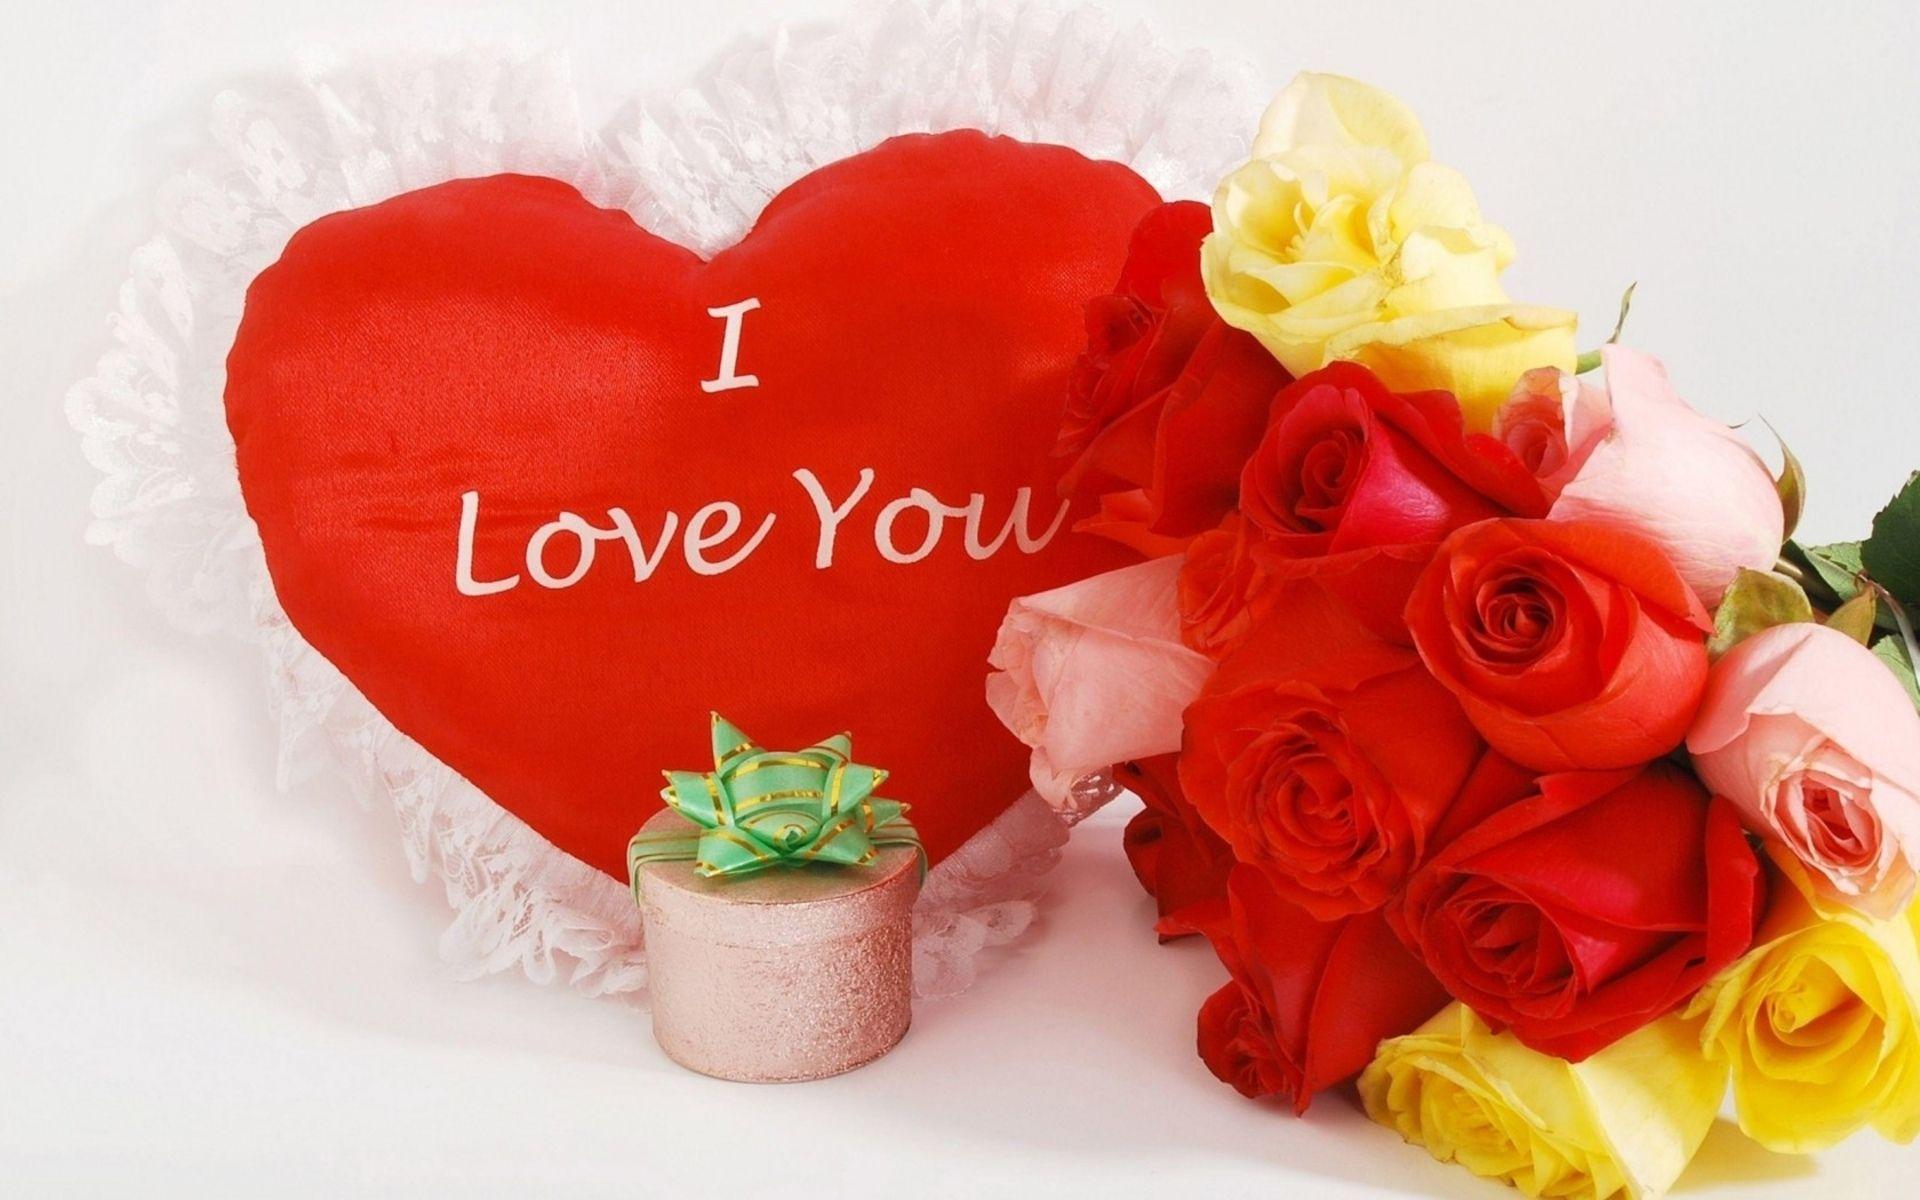 Best Wallpaper Love Flower - 27736ad9b26f6ec0ffb228fe45a607a8  2018_117.jpg